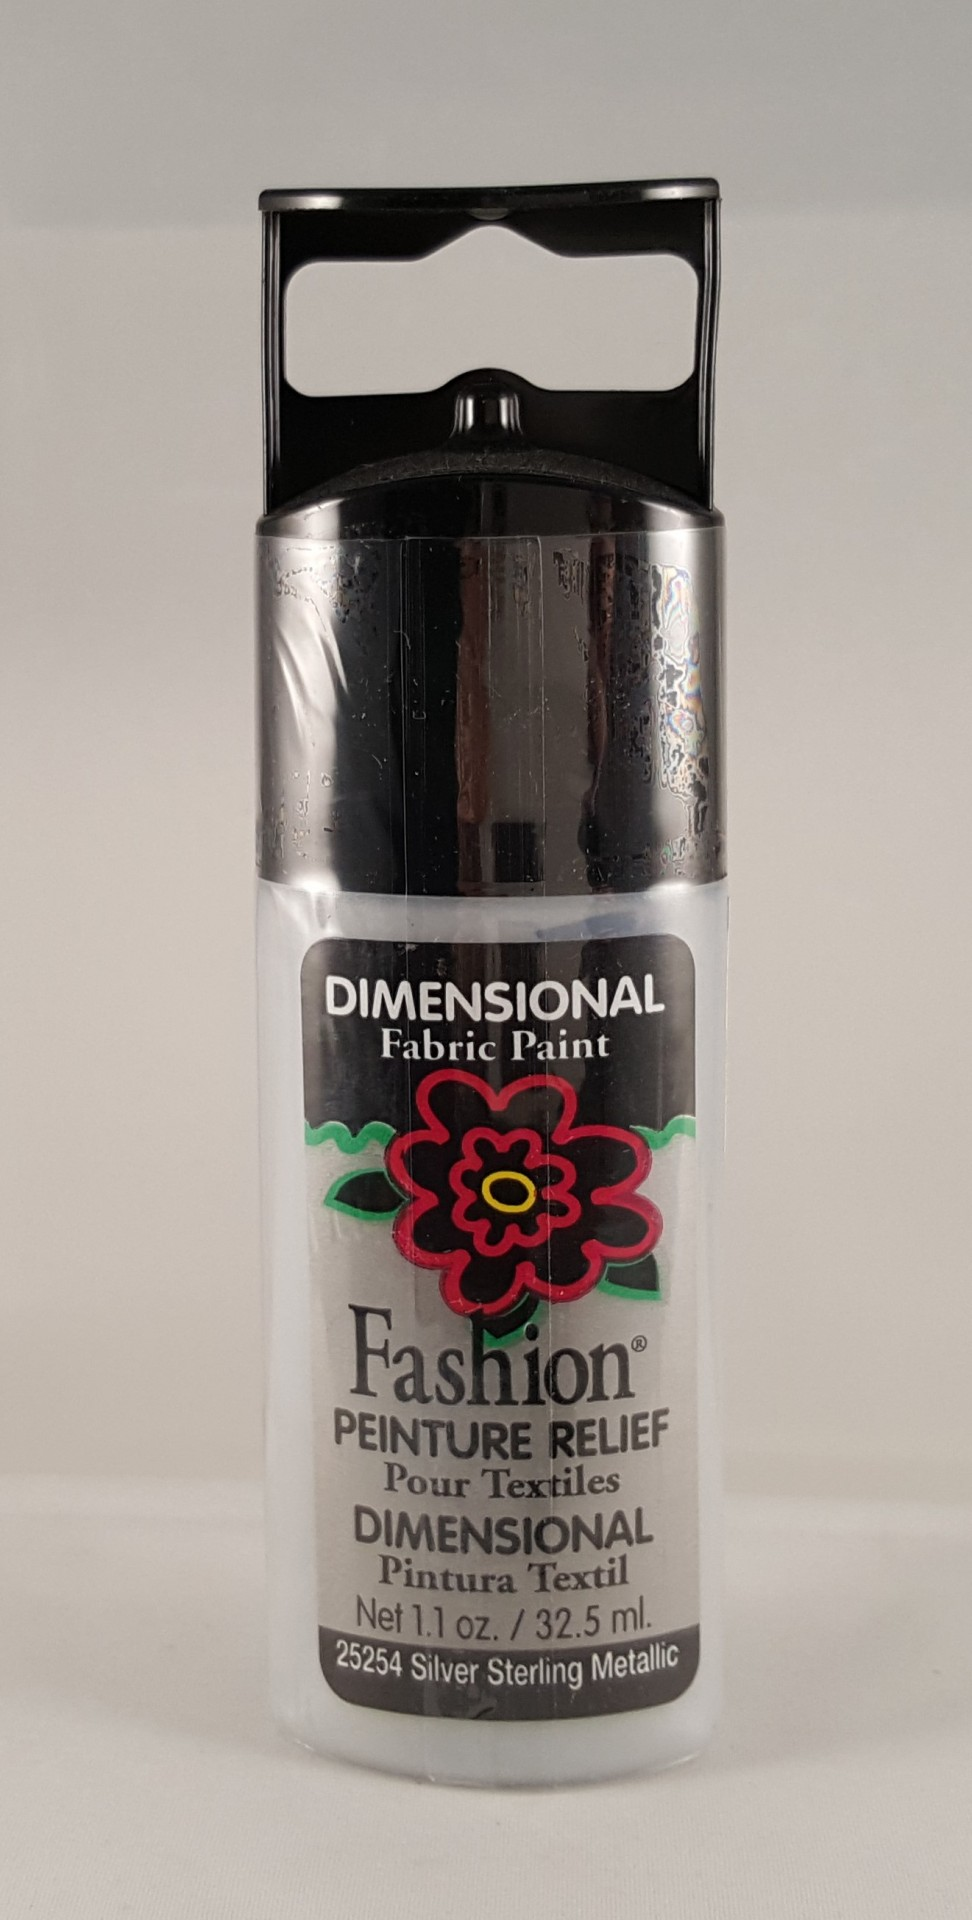 Tinta Dimensional para Tecido Fashion Silver sterling metallic